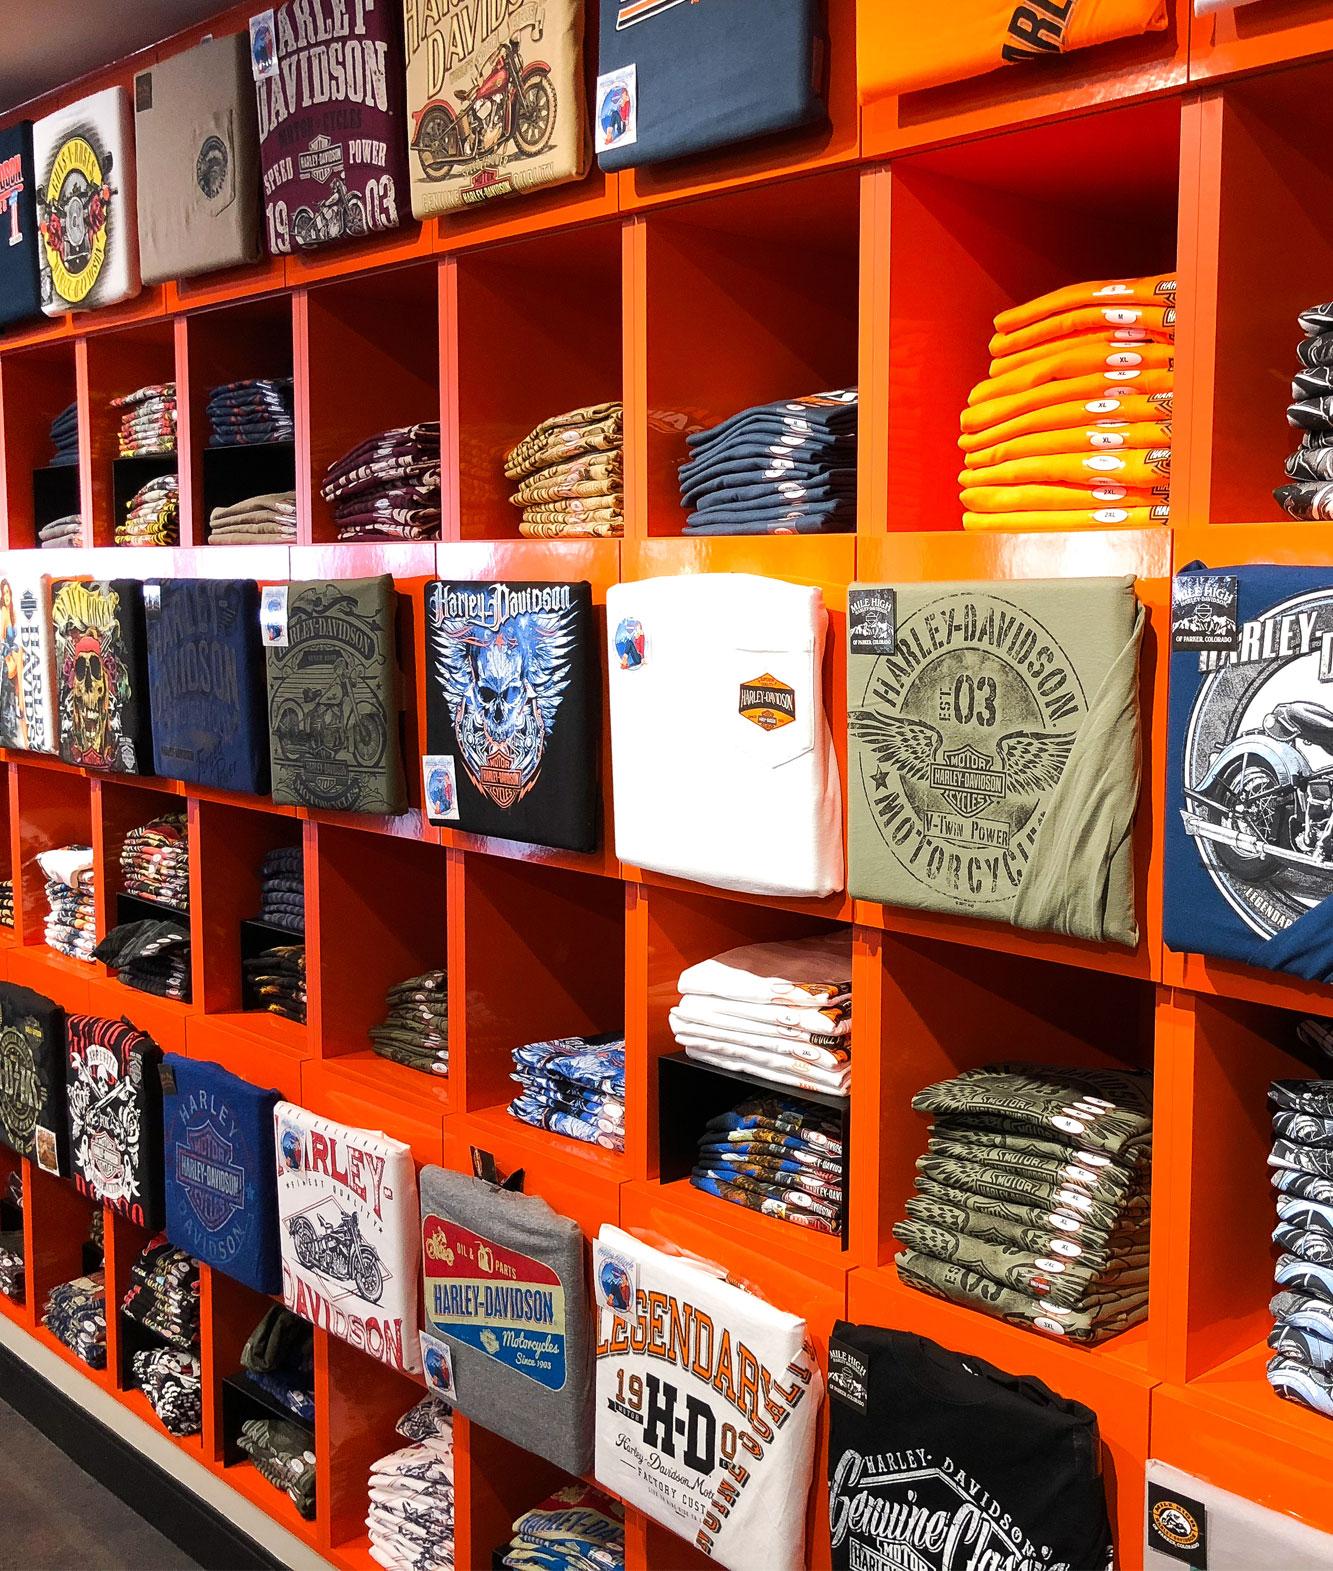 Front Range Electrical Engineering Mile High Harley Davidson Motorcycles Parker Retail Showroom Lighting